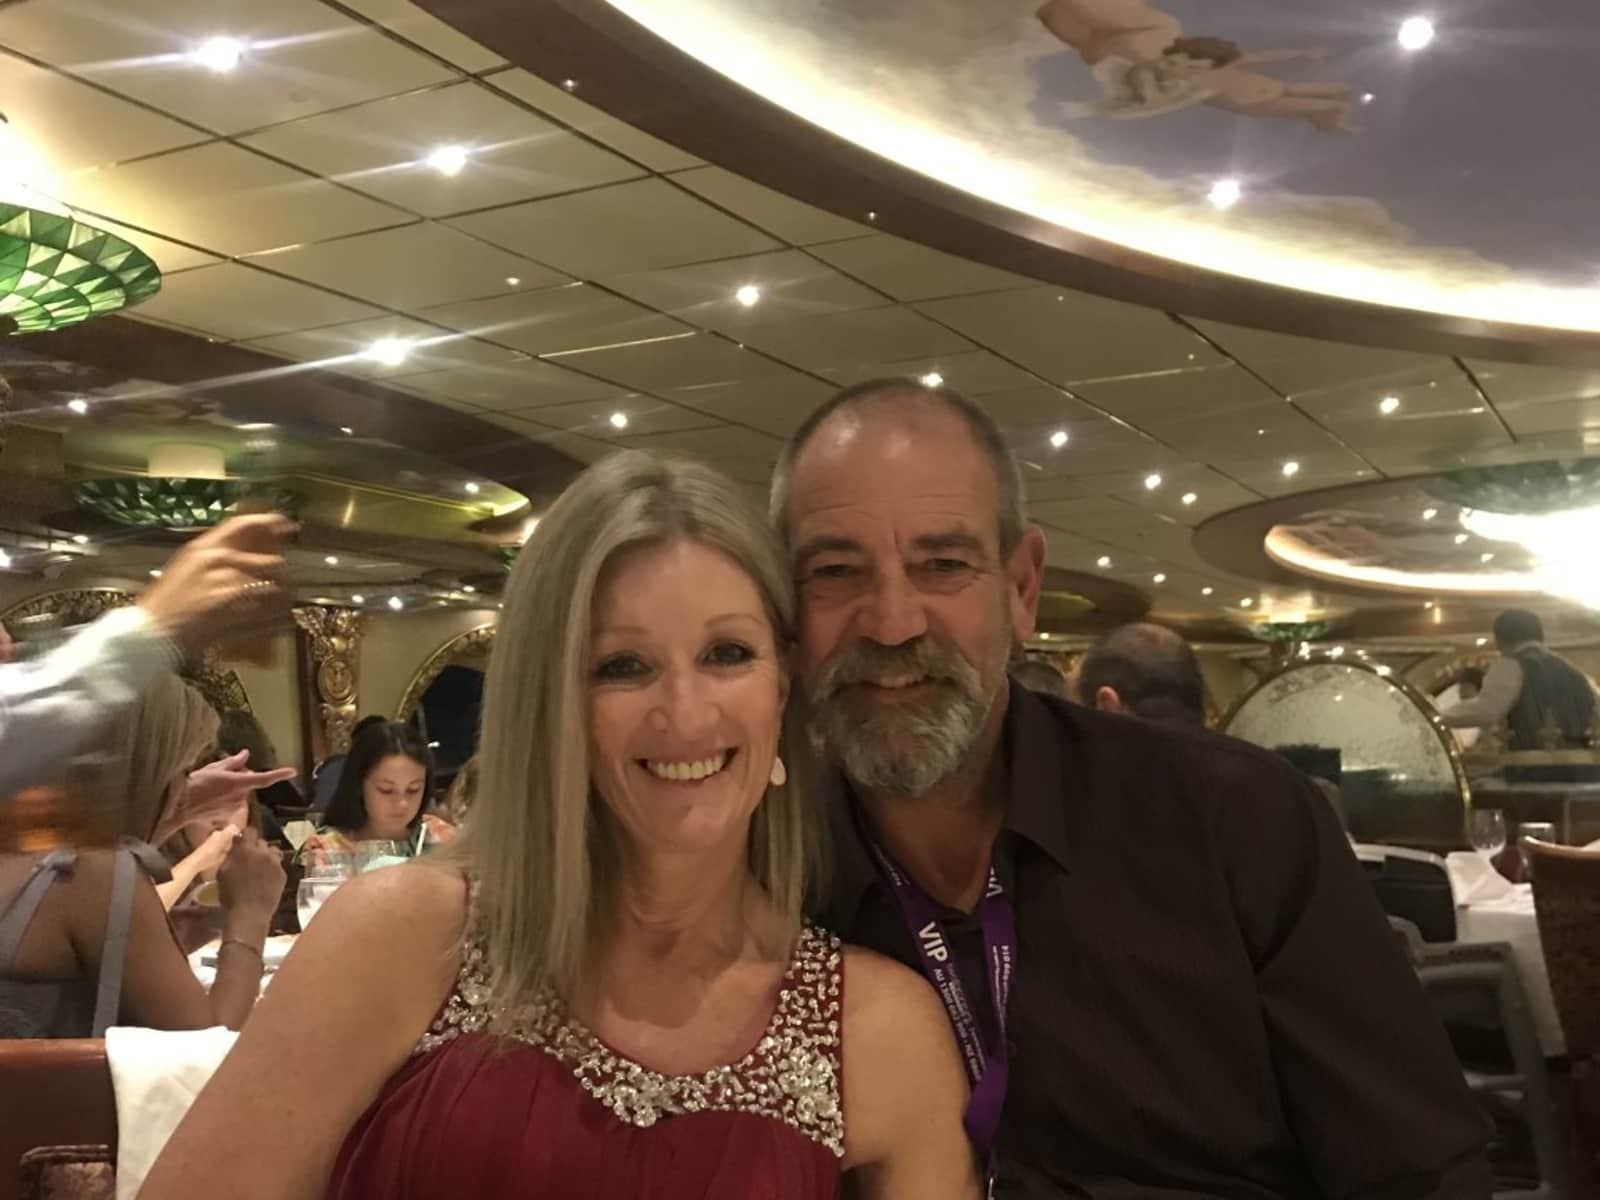 Amanda & Michael from Adelaide, South Australia, Australia